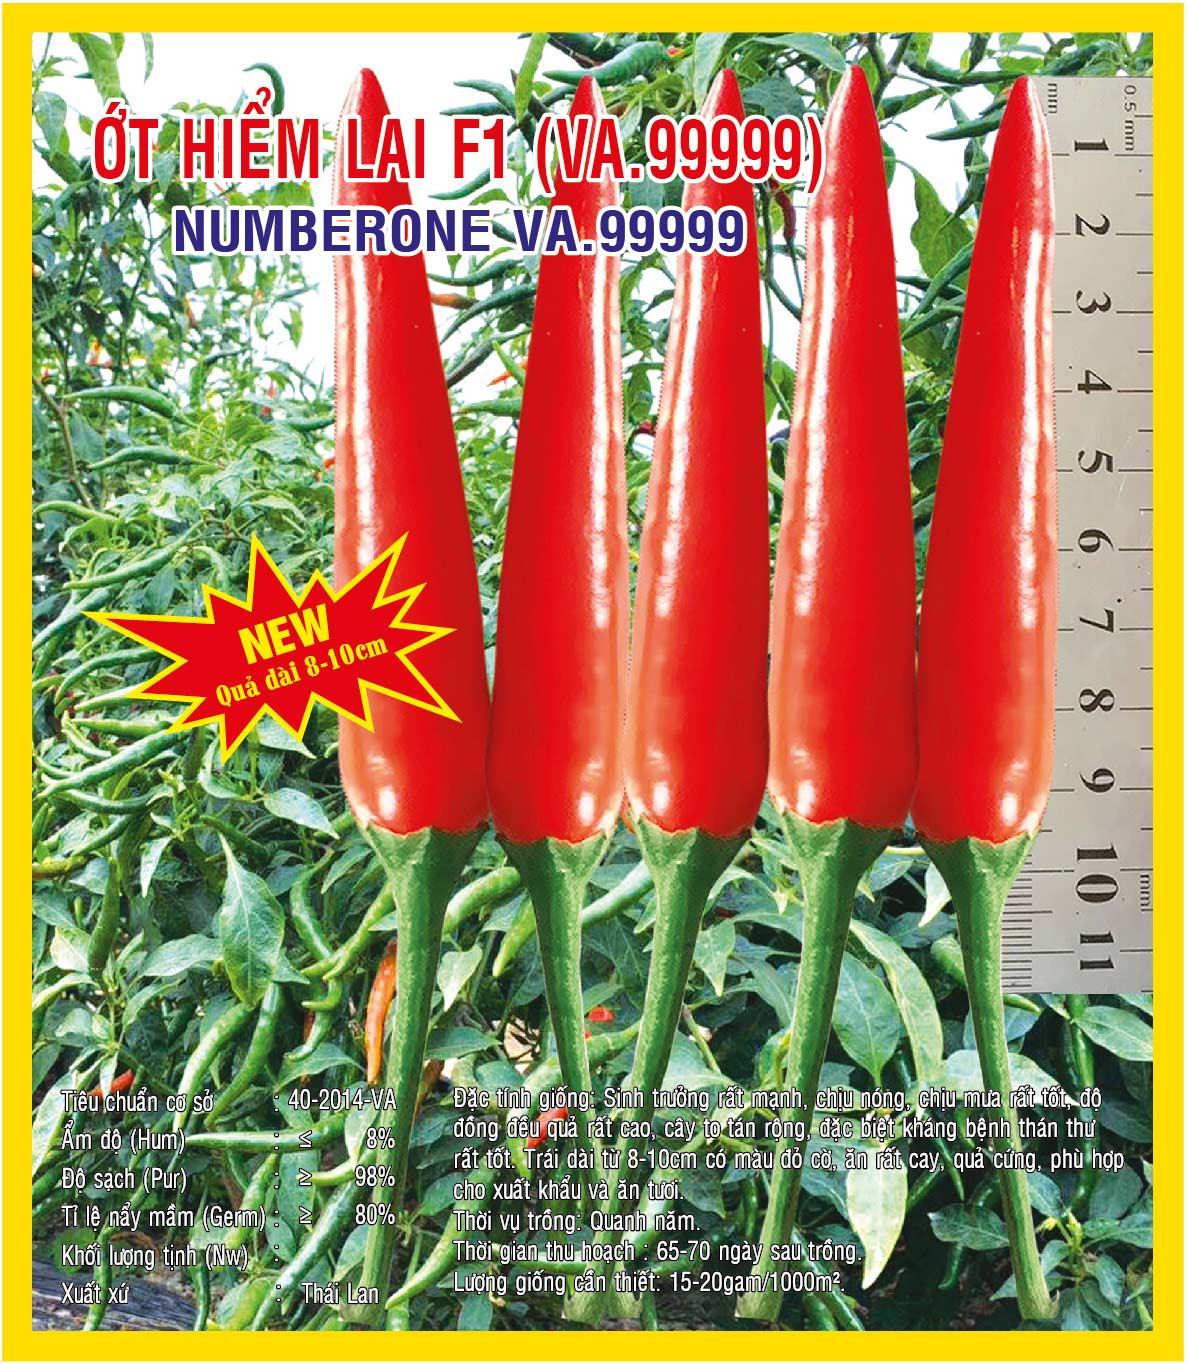 Hạt giống Ớt Hiểm Lai F1 Numberone (VA.99999) 5gr